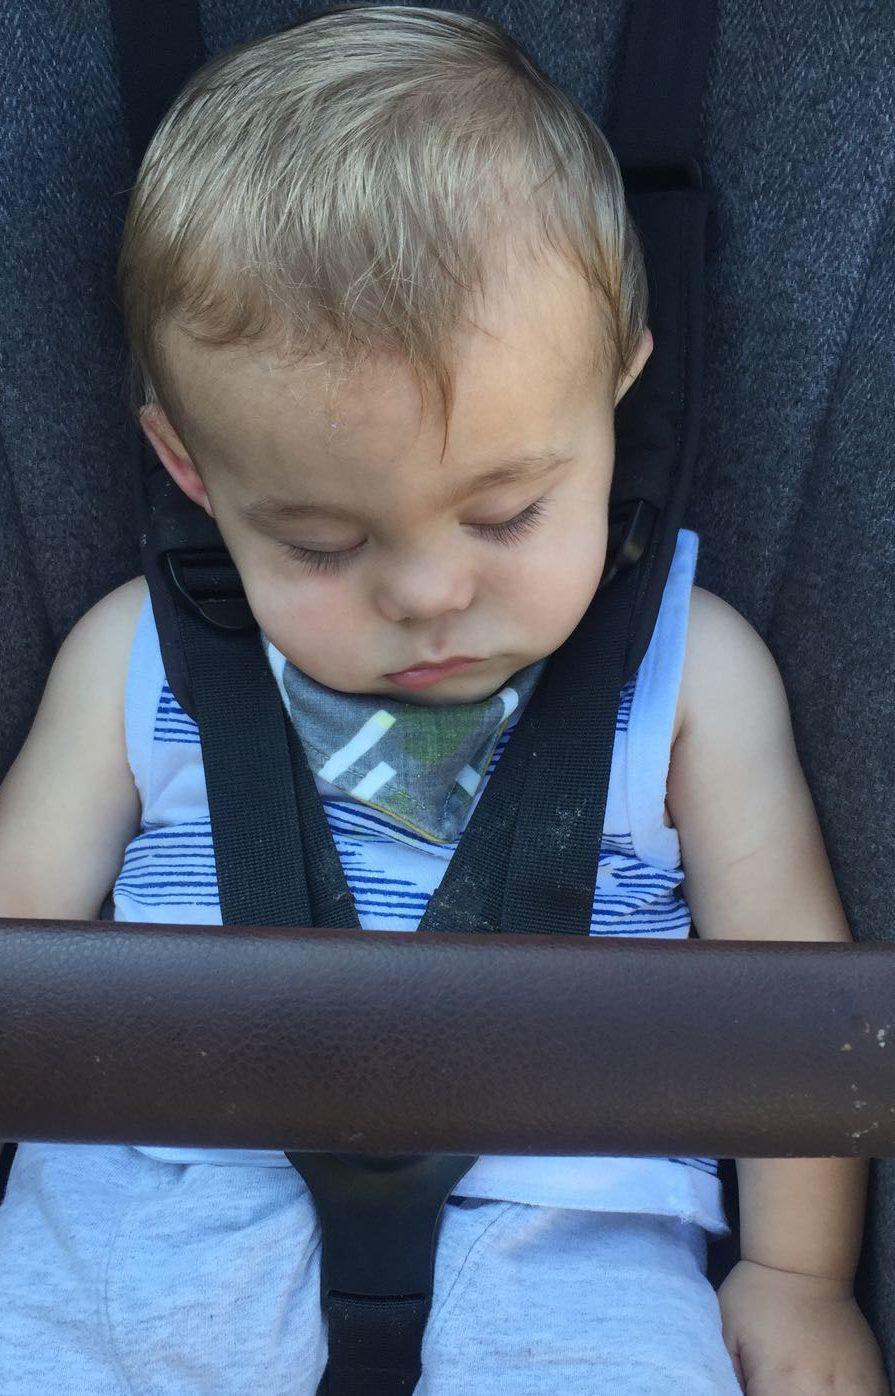 Managing Baby Sleep While Traveling